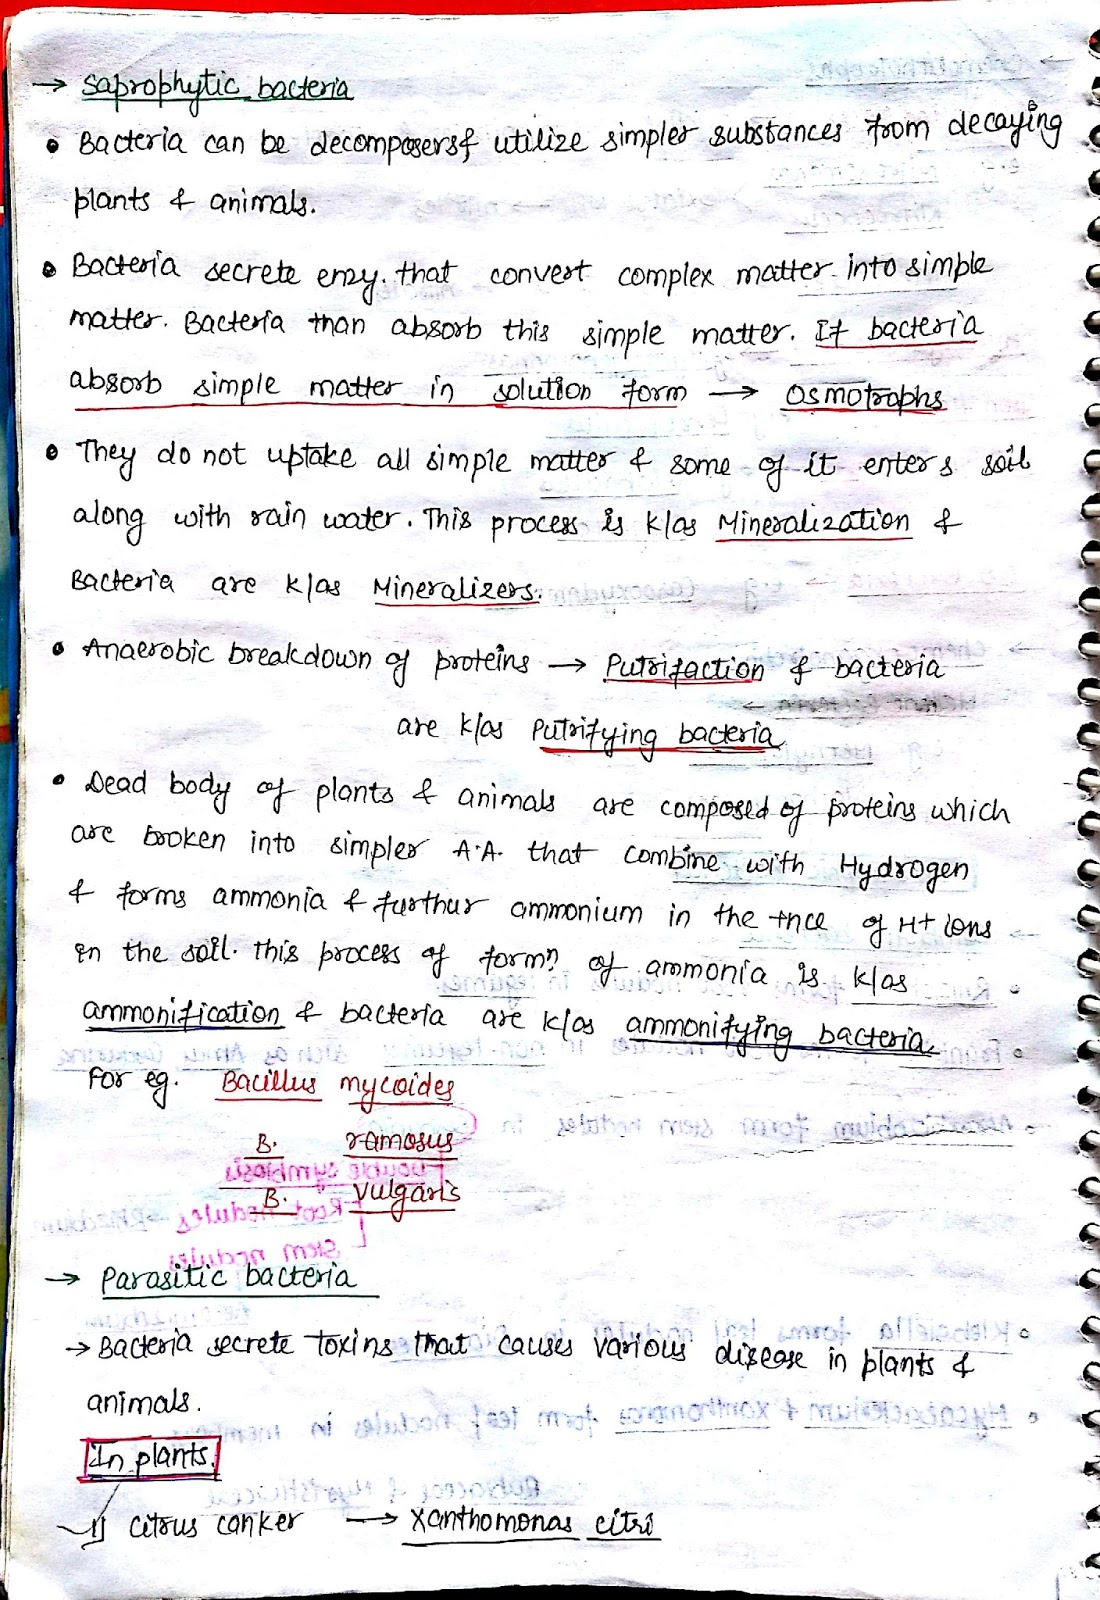 PCB Notes: Kingdom Monera Notes (biology)